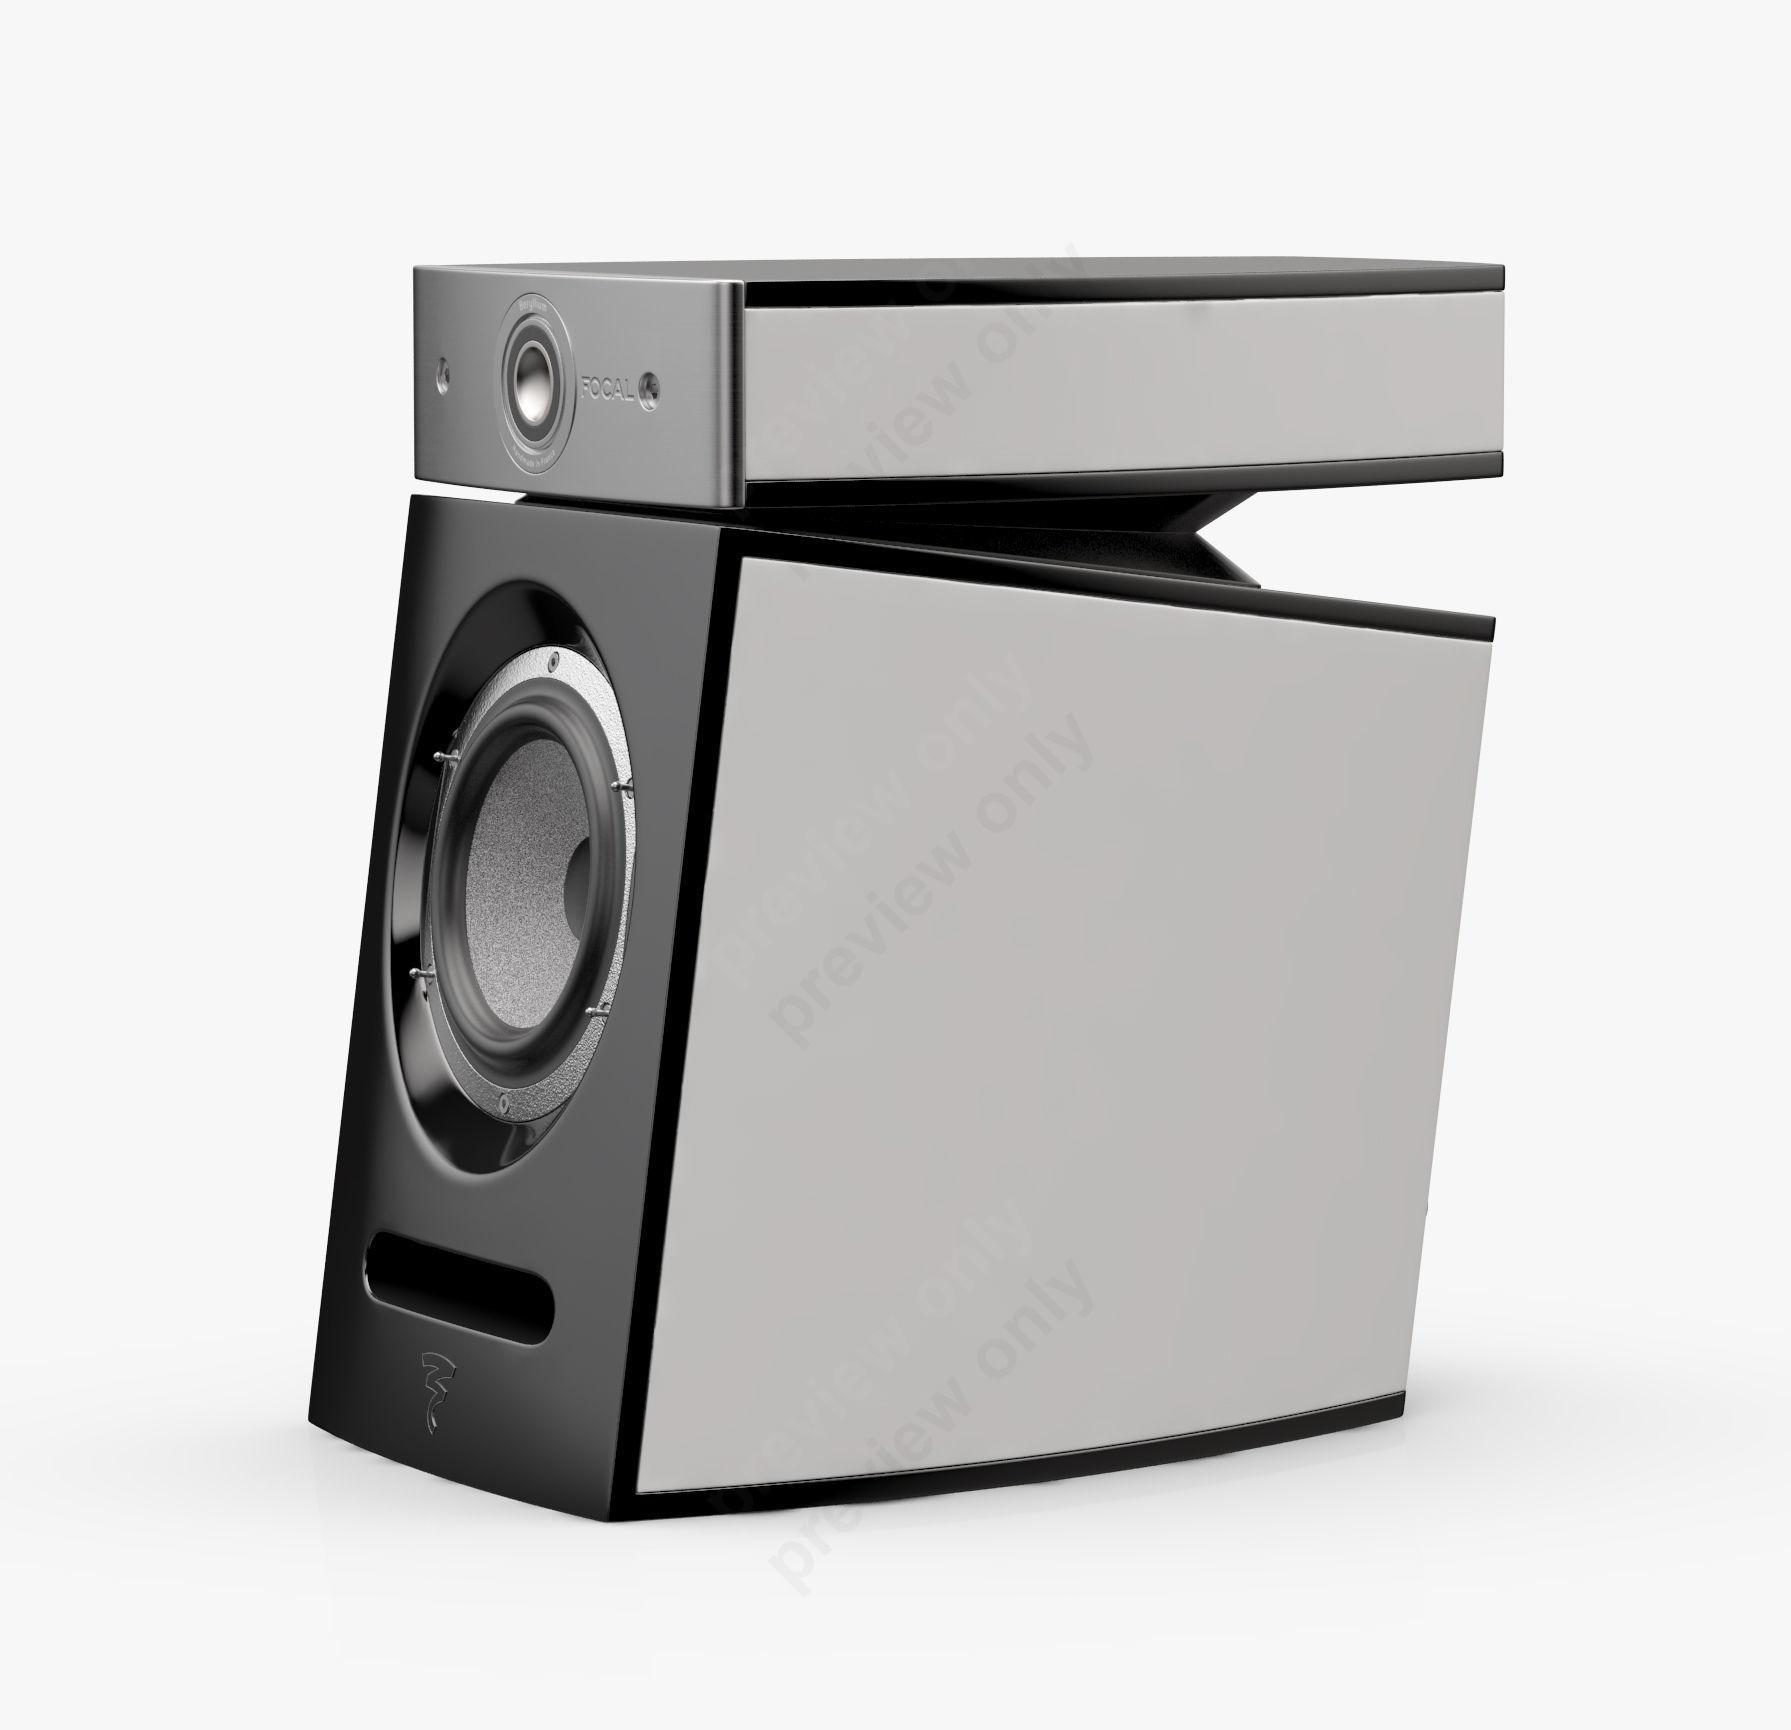 focal-jmlab-diablo-utopia-carrara-white-3d-model-max-obj-3ds